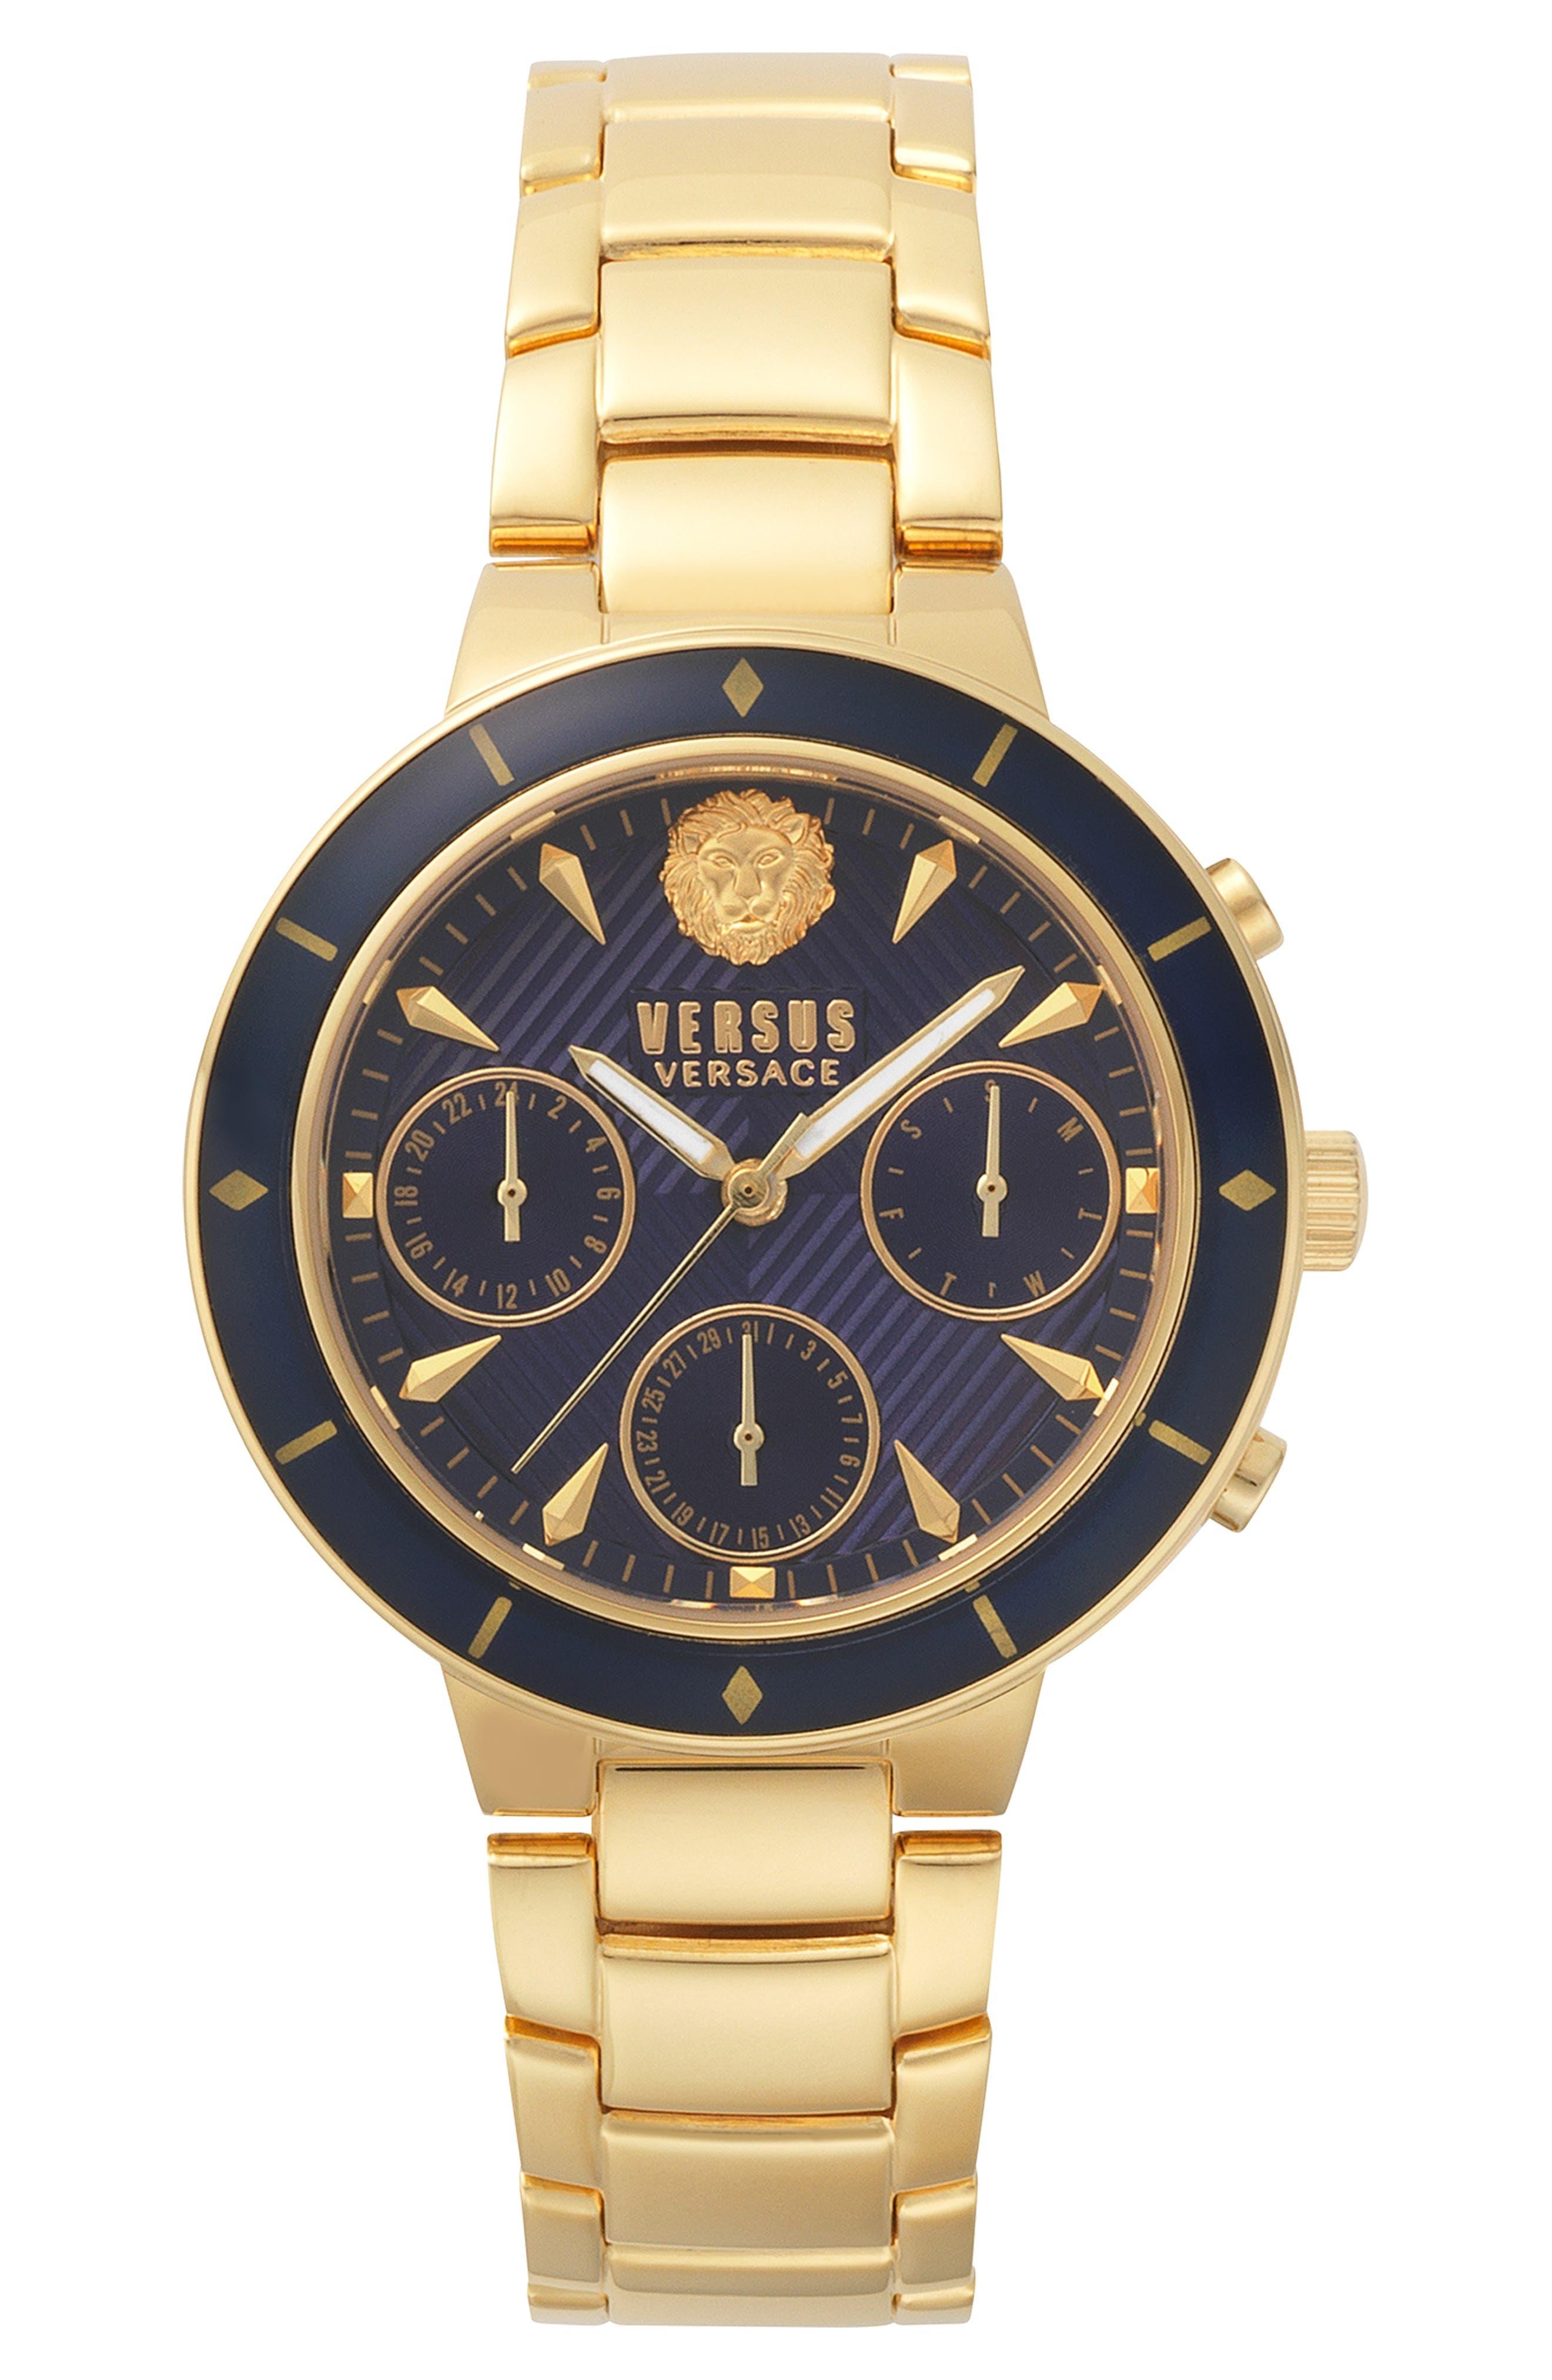 VERSUS VERSACE, Harbour Heights Chronograph Bracelet Watch, 38mm, Main thumbnail 1, color, GOLD/ BLUE